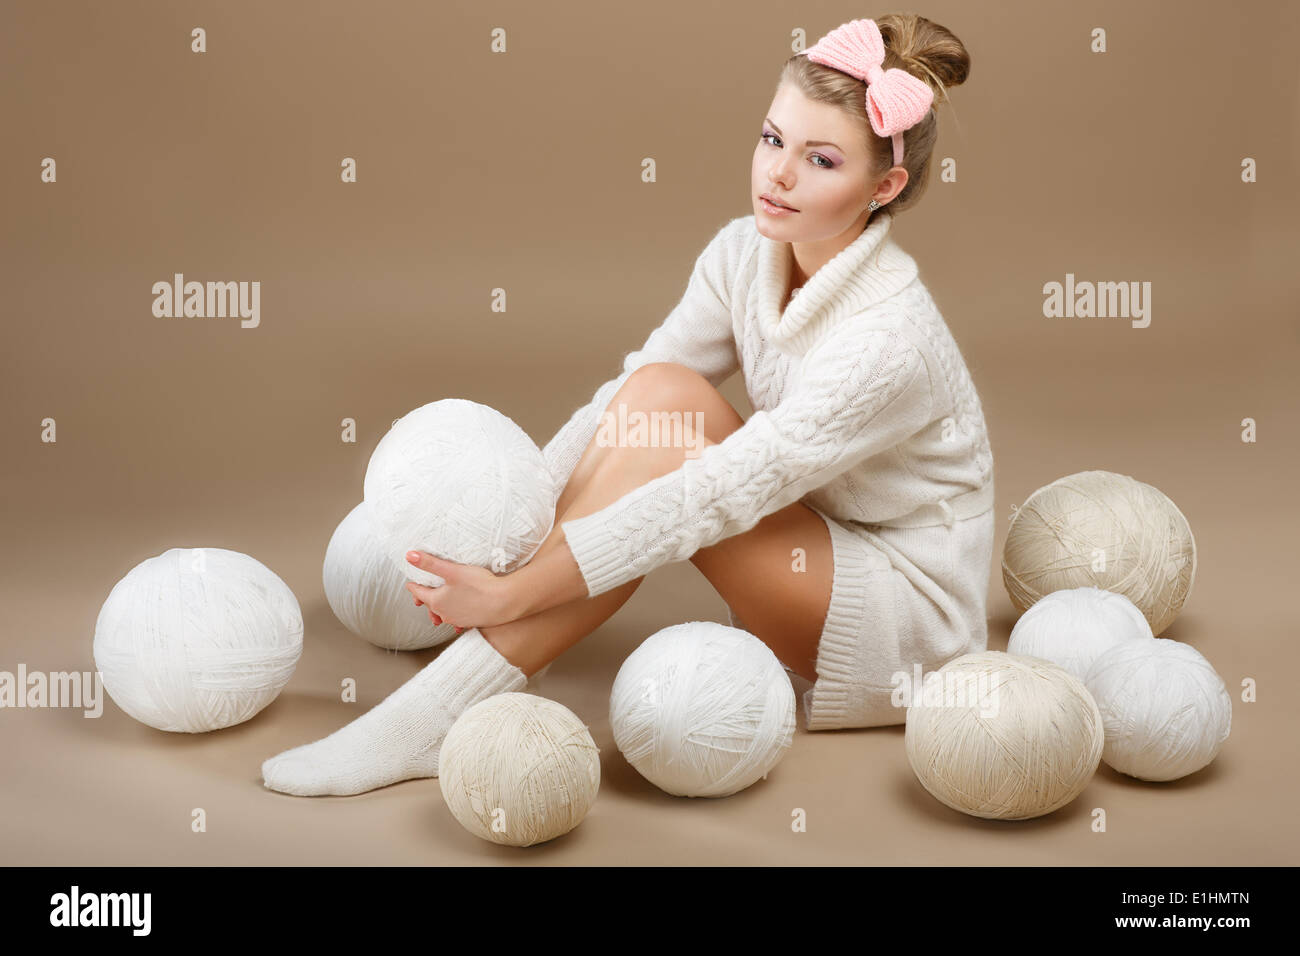 Crochet. Beautiful Needlewoman Sitting with Pile of White Skeins of Yarn. Needlecraft - Stock Image